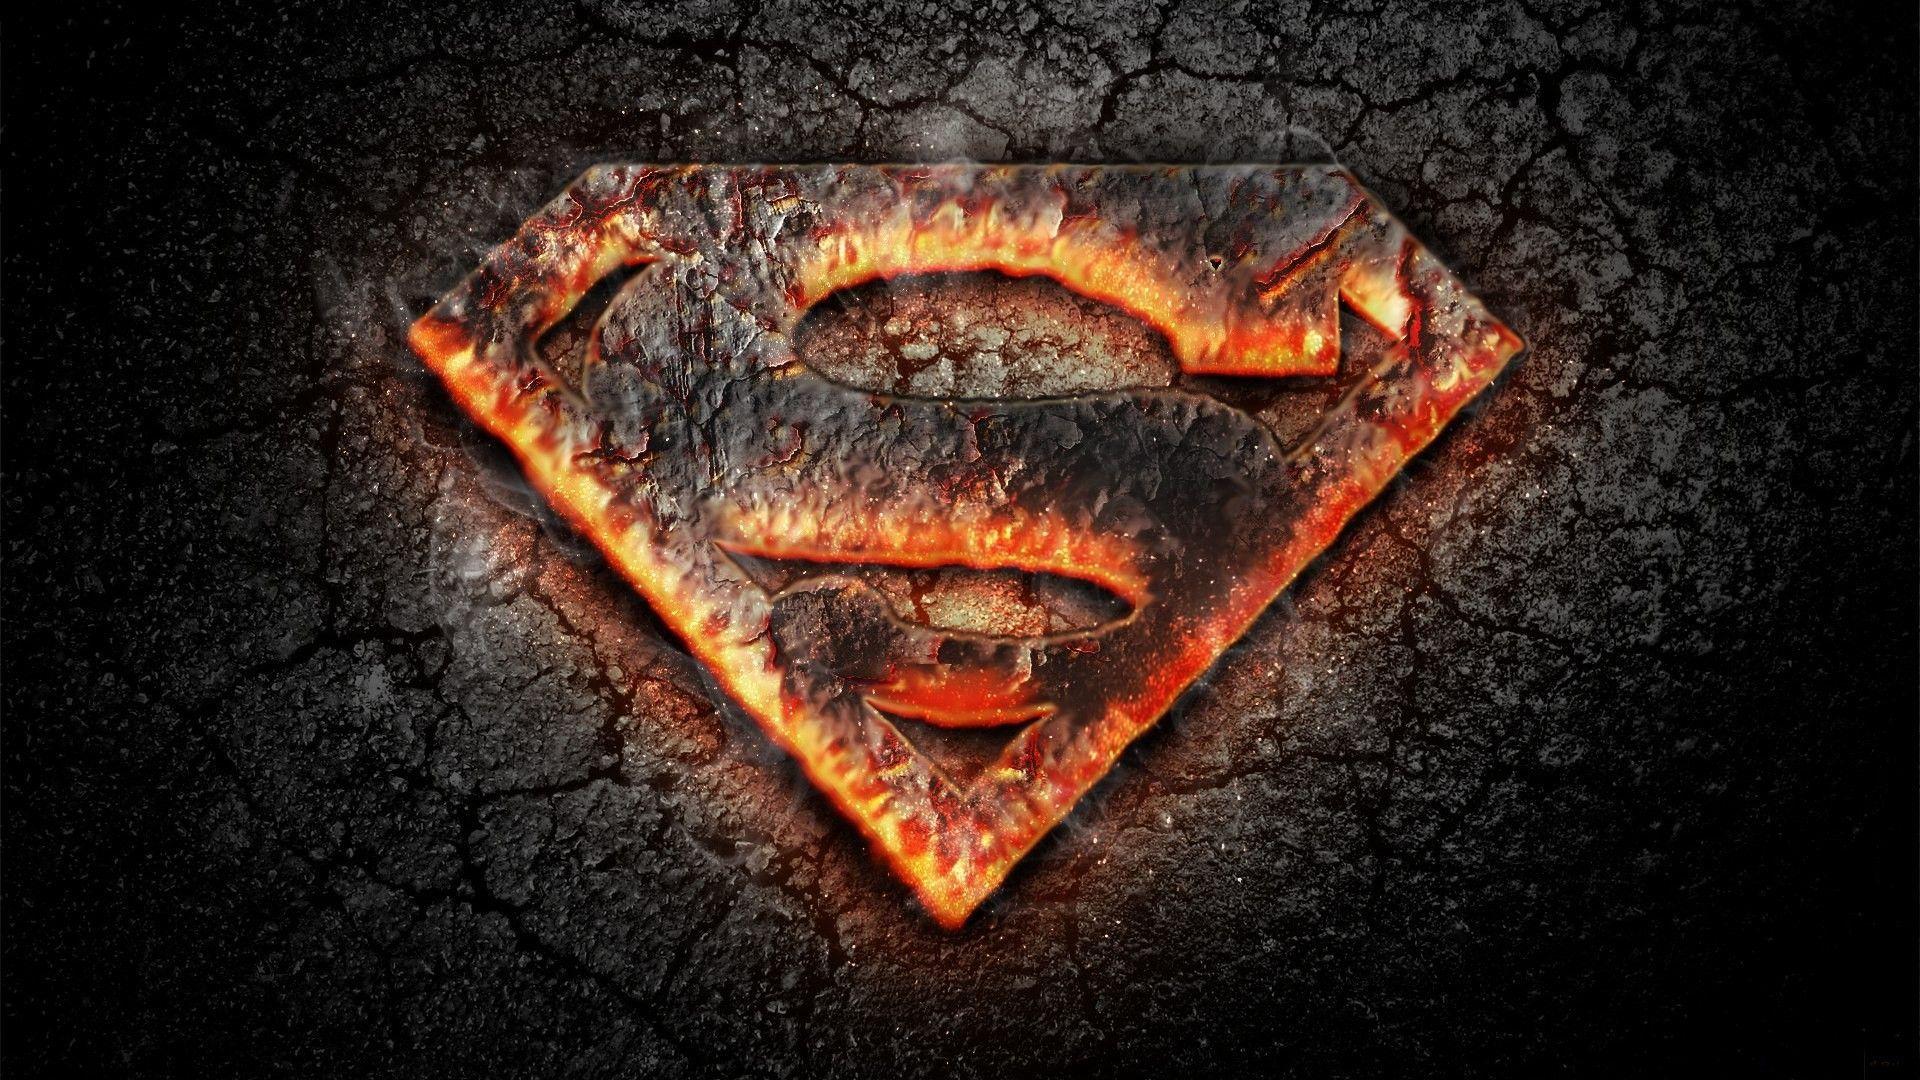 Hd superman wallpaper1920x1080 1920x1080 wallpaper pinterest hd superman wallpaper1920x1080 voltagebd Choice Image